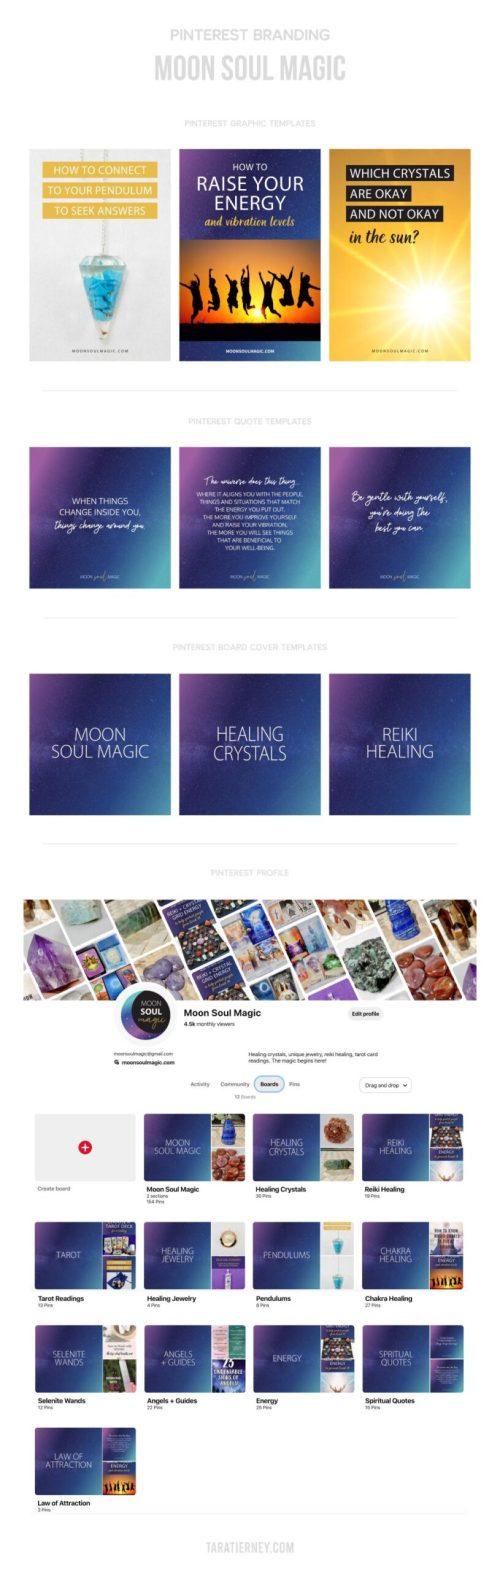 Pinterest Branding - Moon Soul Magic